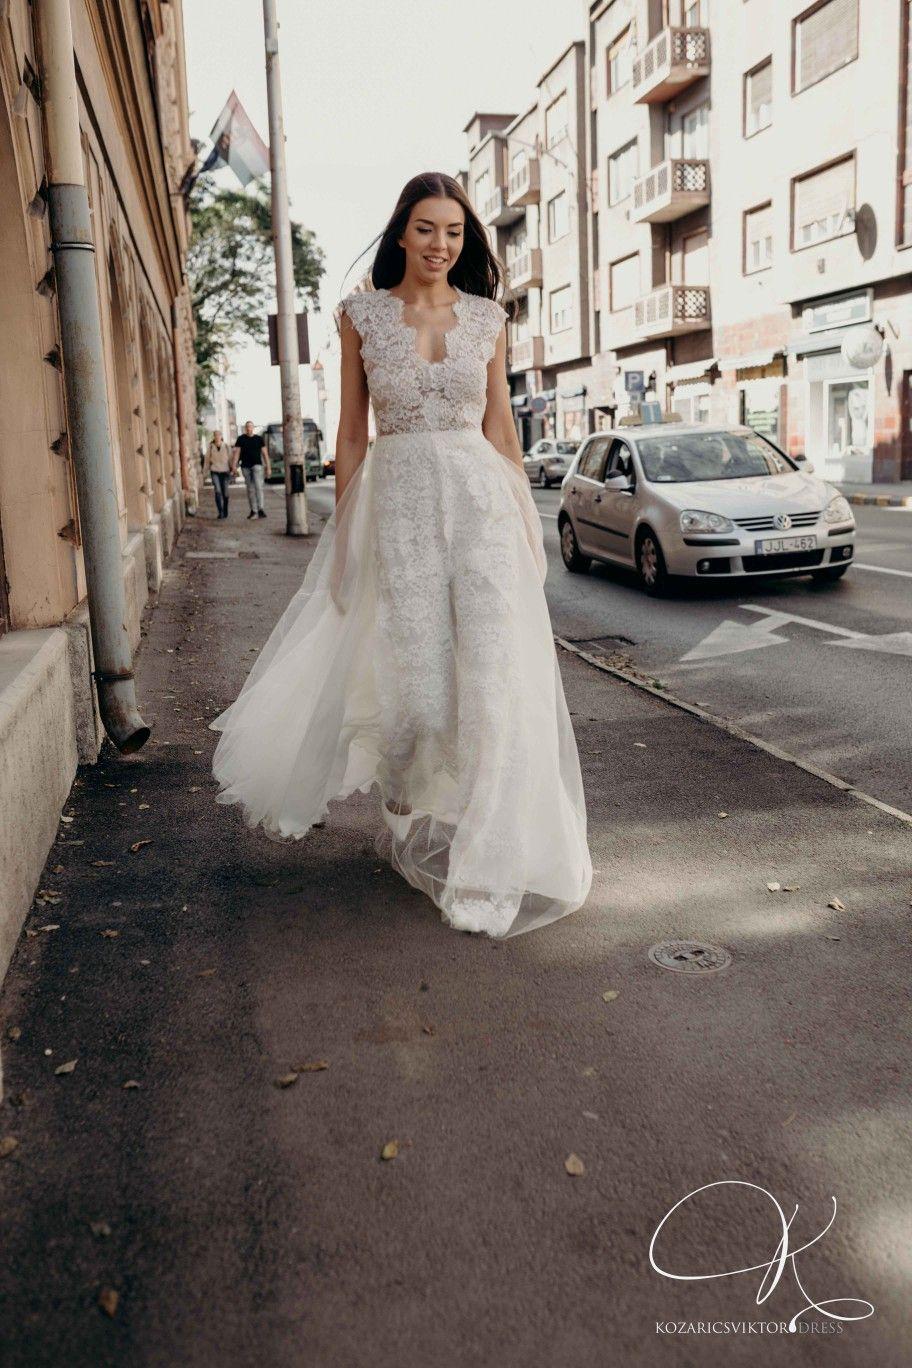 Whitewedding whitewedding esküvői ruhák made by